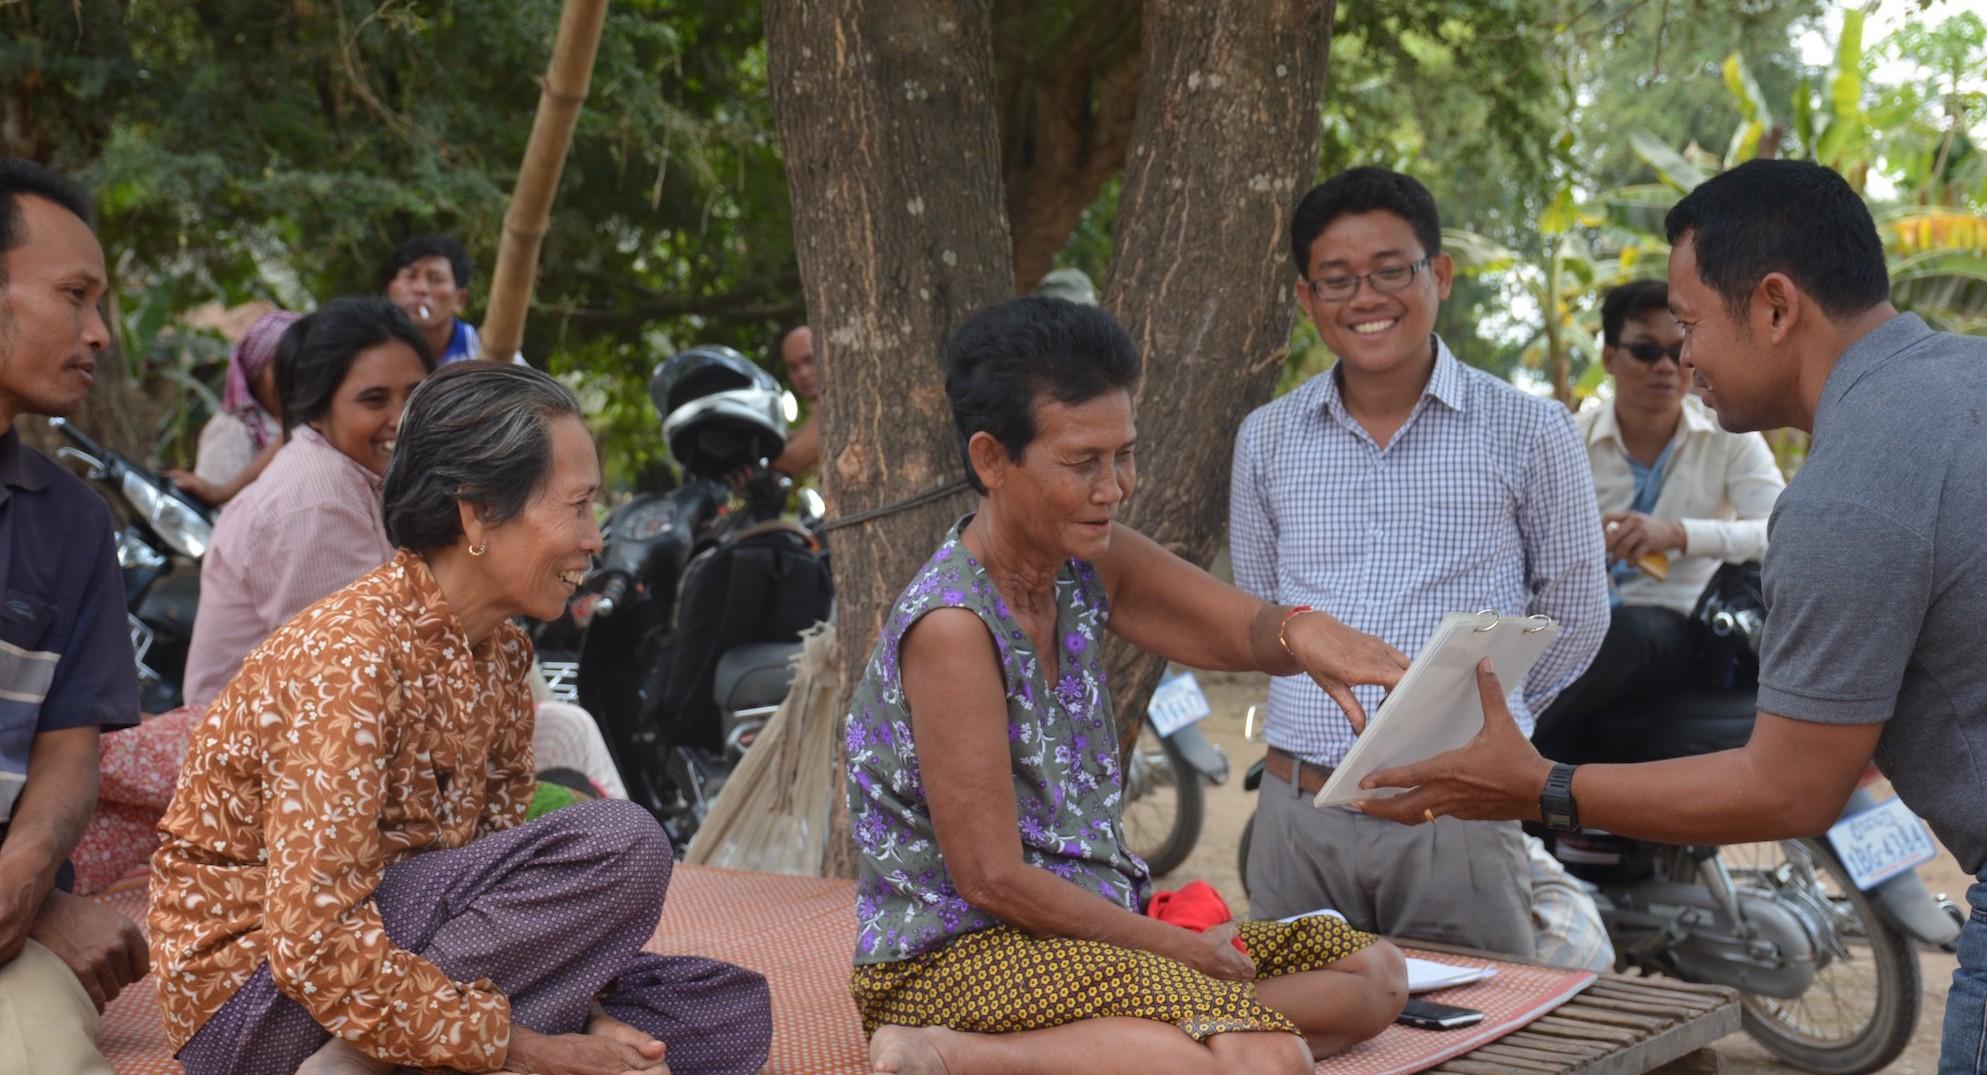 Whitten & Roy sales presentation in Cambodia